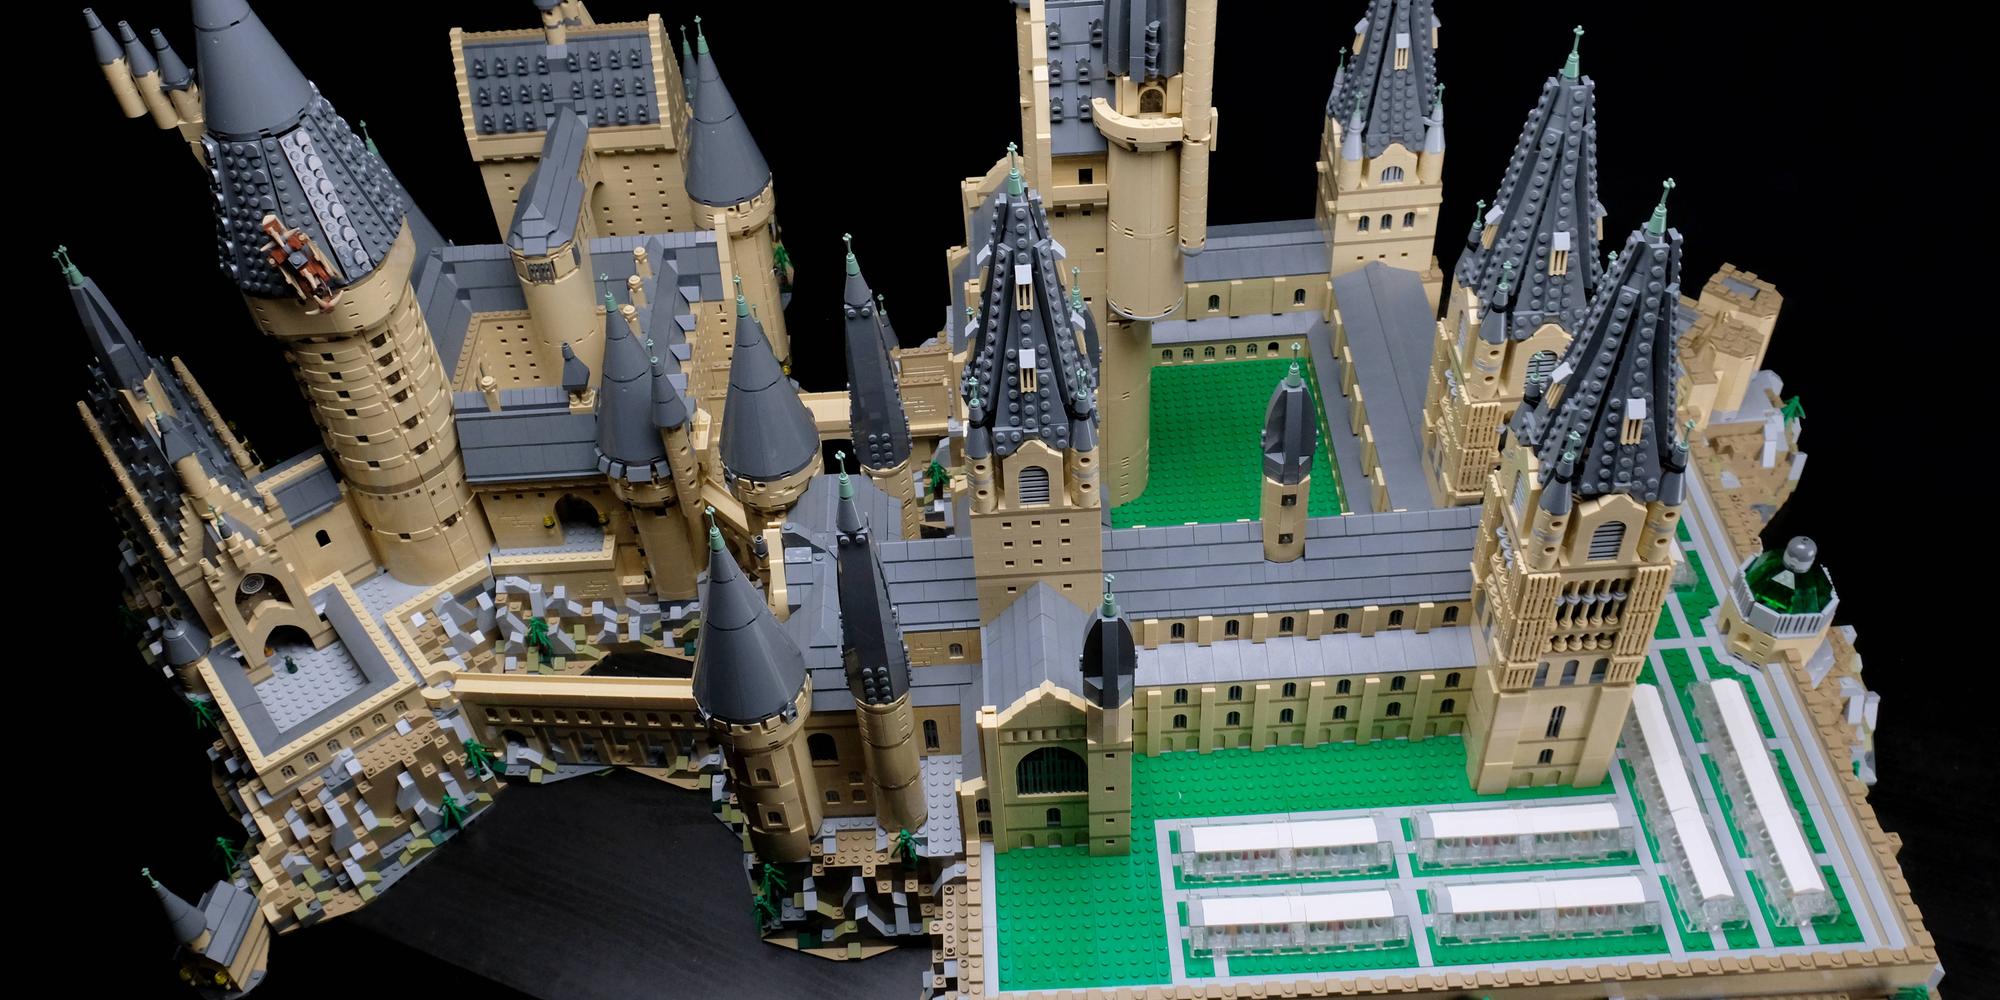 LEGO Hogwarts Castle expansion as seen overhead